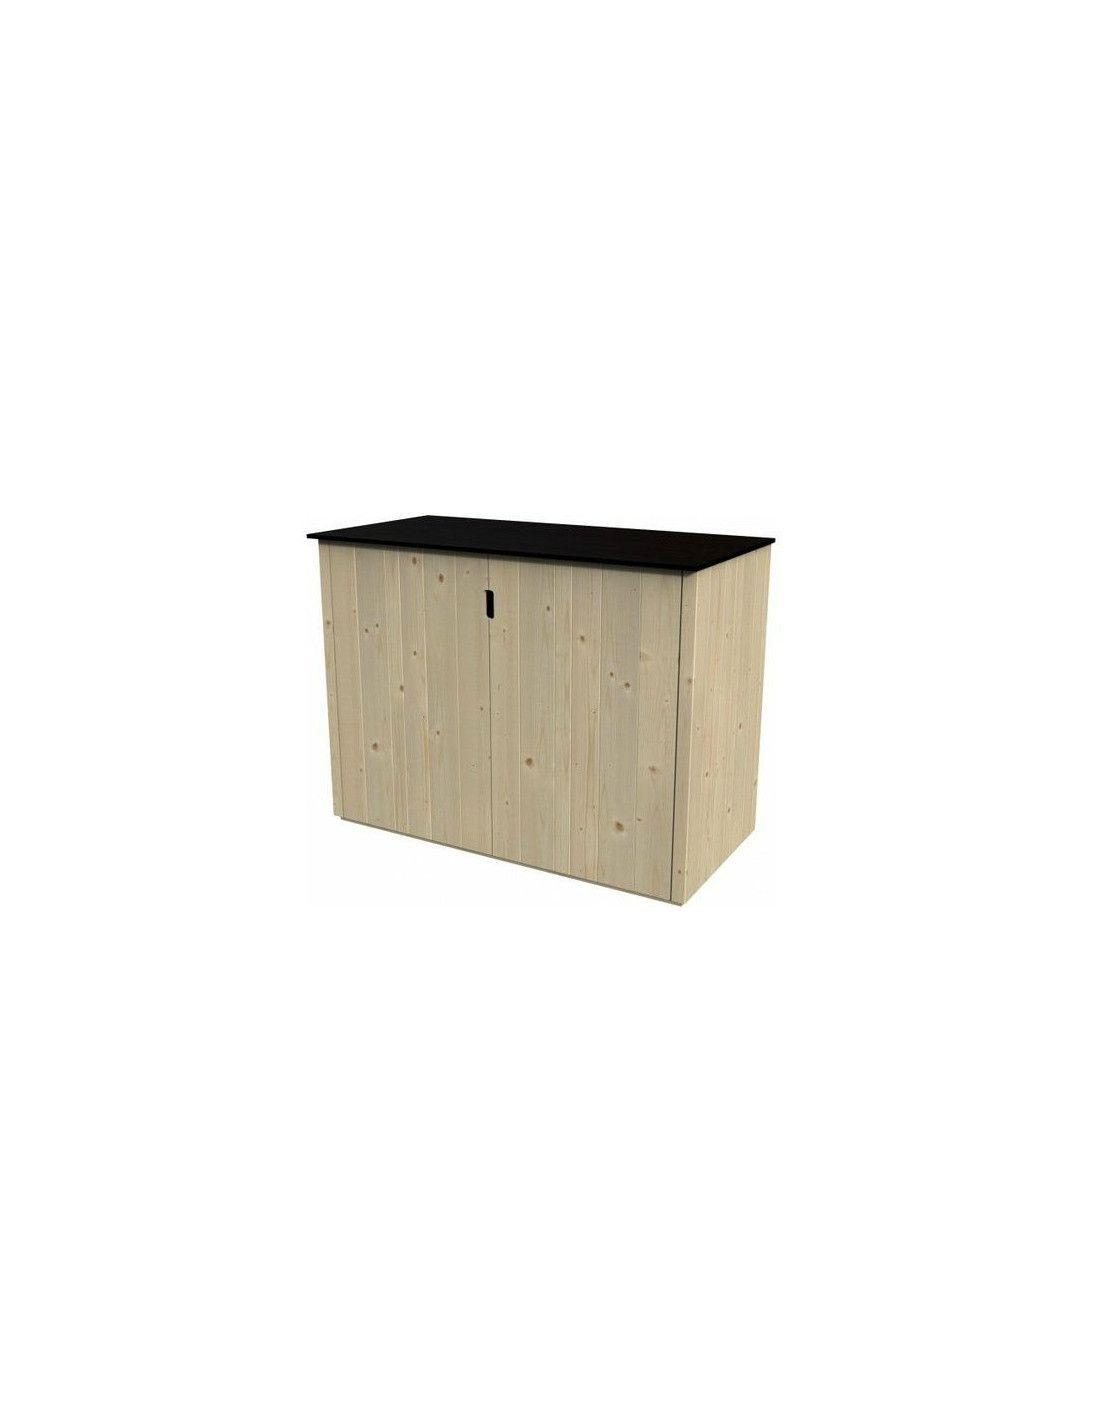 Armarios de exterior en madera ideal para jard n hortum for Armarios para exterior